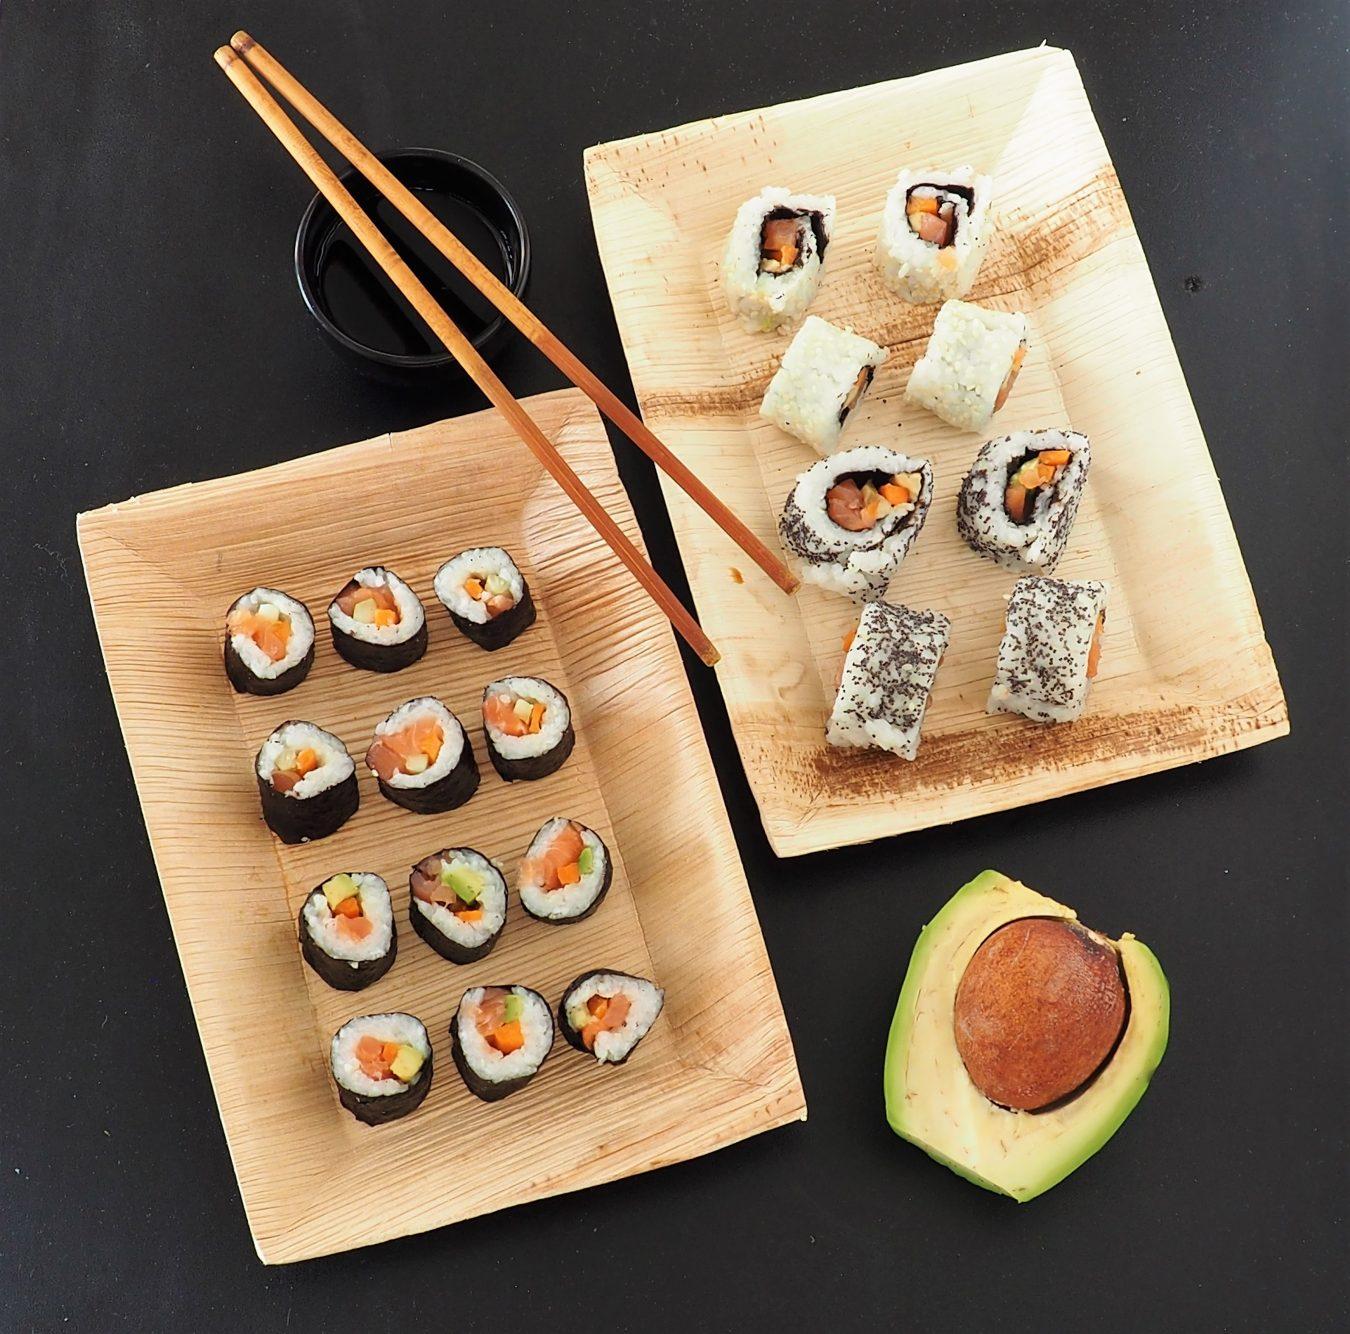 Sushi Fatto In Casa Chiwawa In Cucina